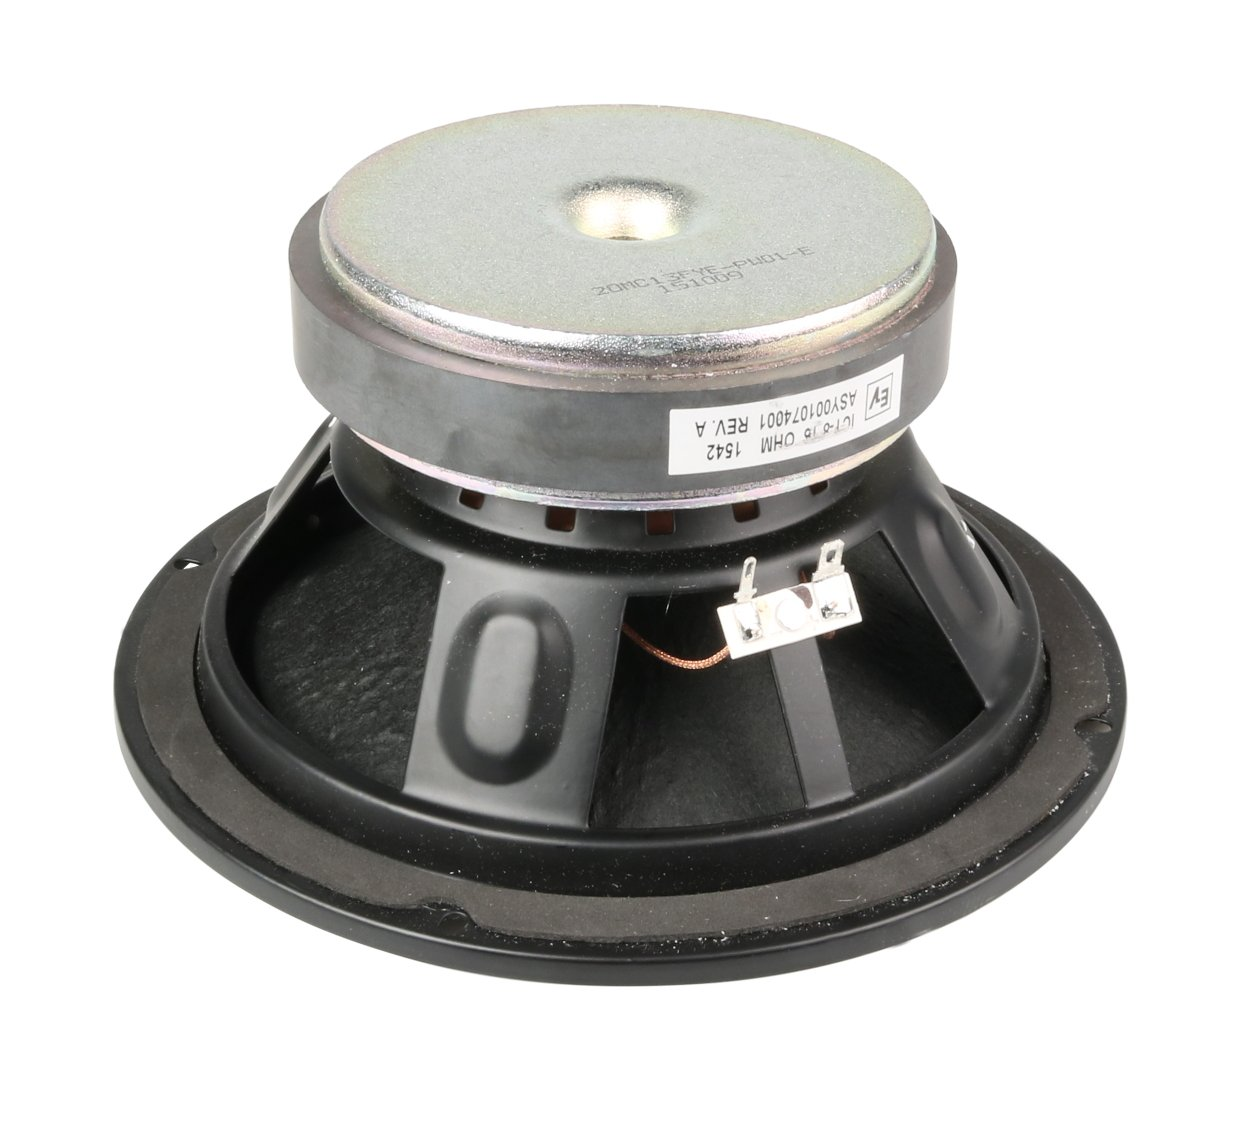 Woofer for EV EVU-2082/95